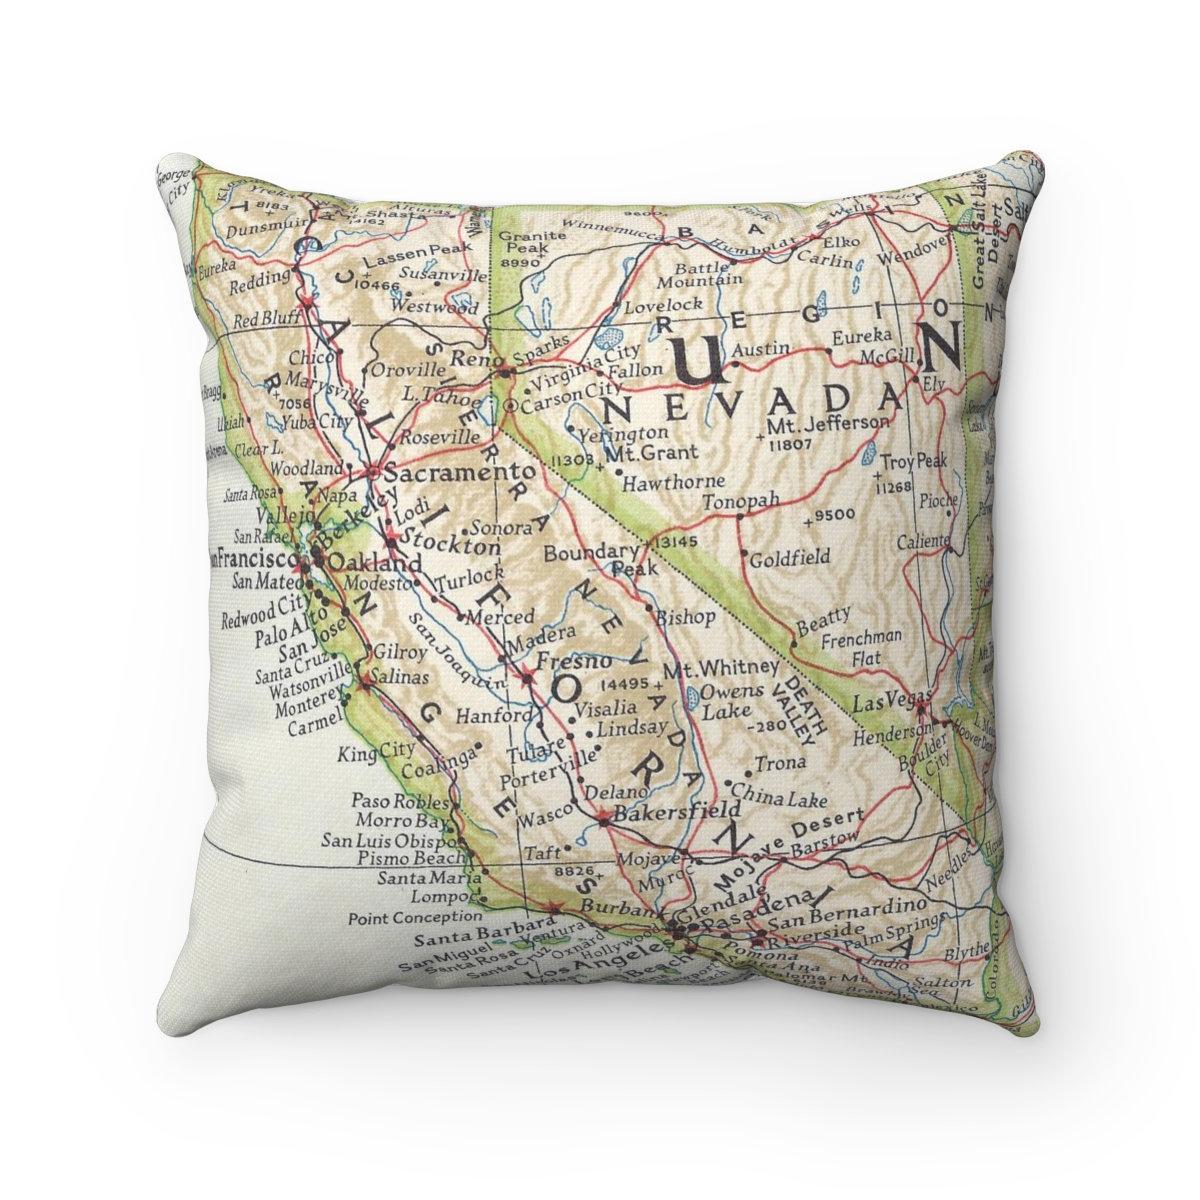 California Vintage Map Pillow California Pillow California   Etsy - California Map Pillow